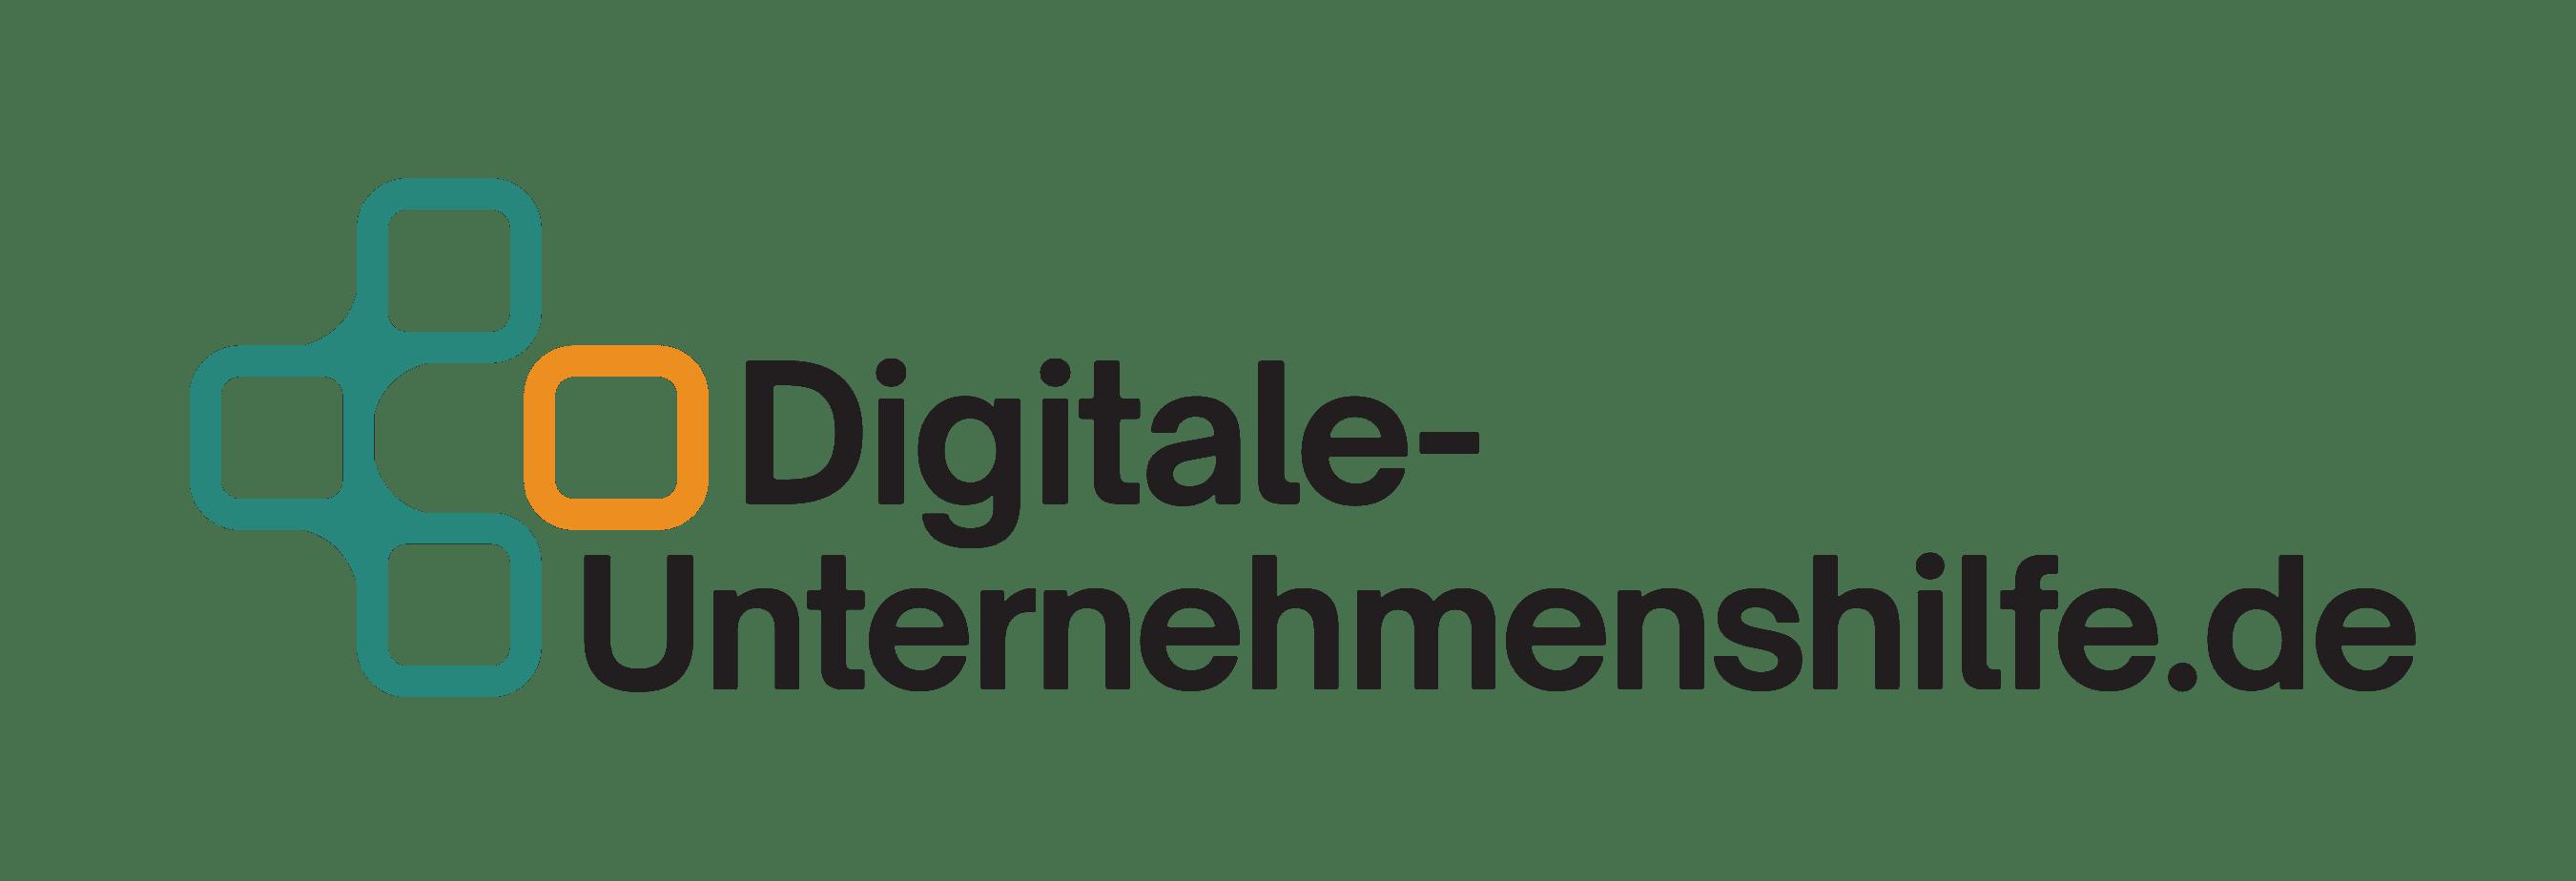 Digitale Unternehmenshilfe - Digitalisierungsberatung